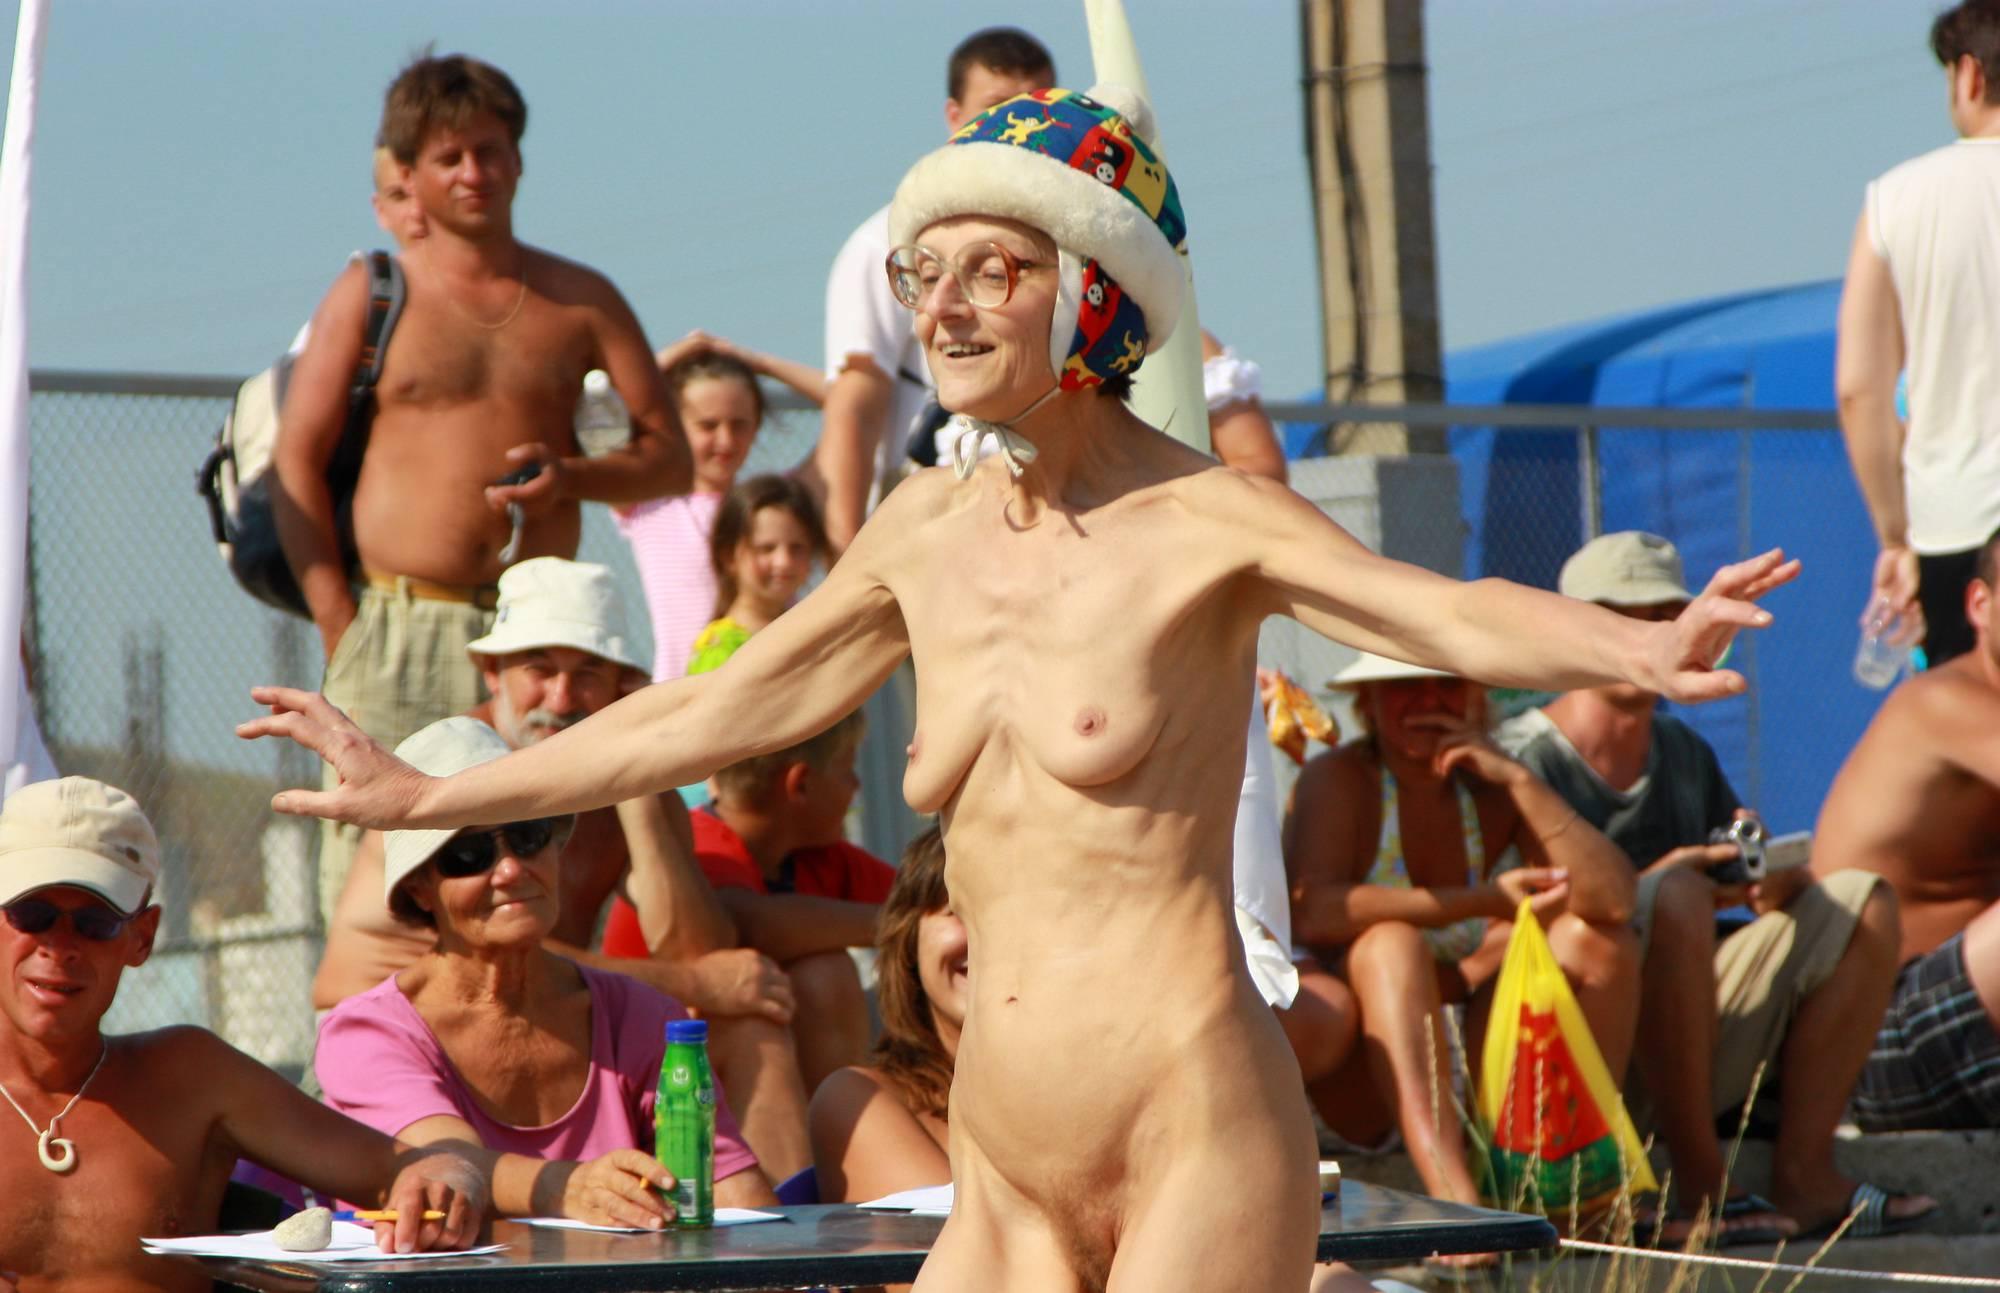 Nudist Photos Neptune Grandmas Dance - 2